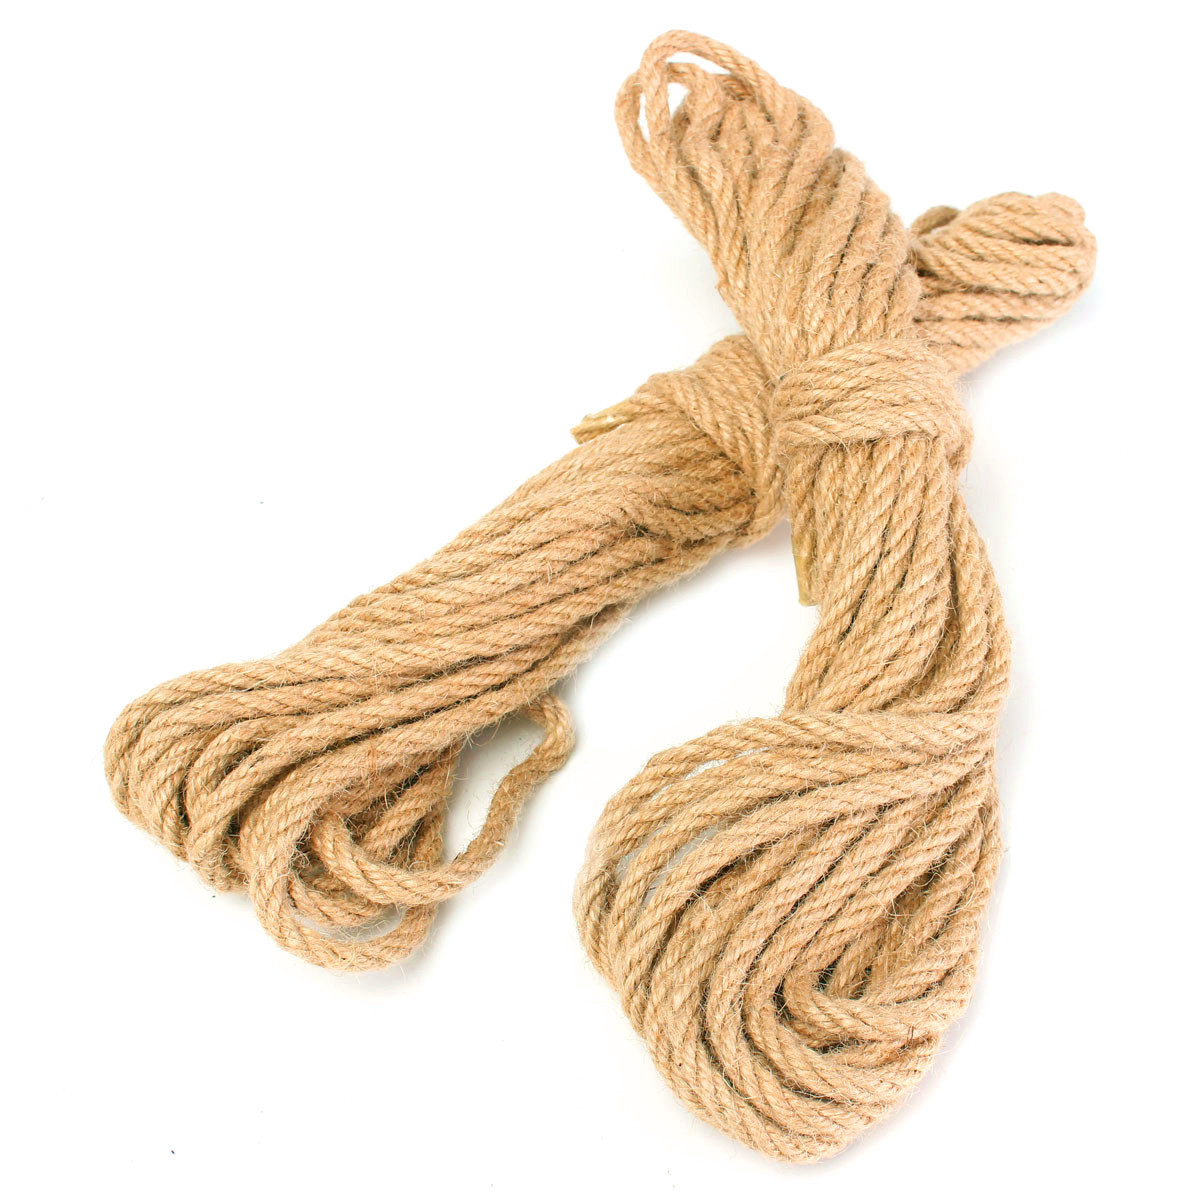 2 buah 10 m memutar kain goni Jute benang tali rami tali sisal .